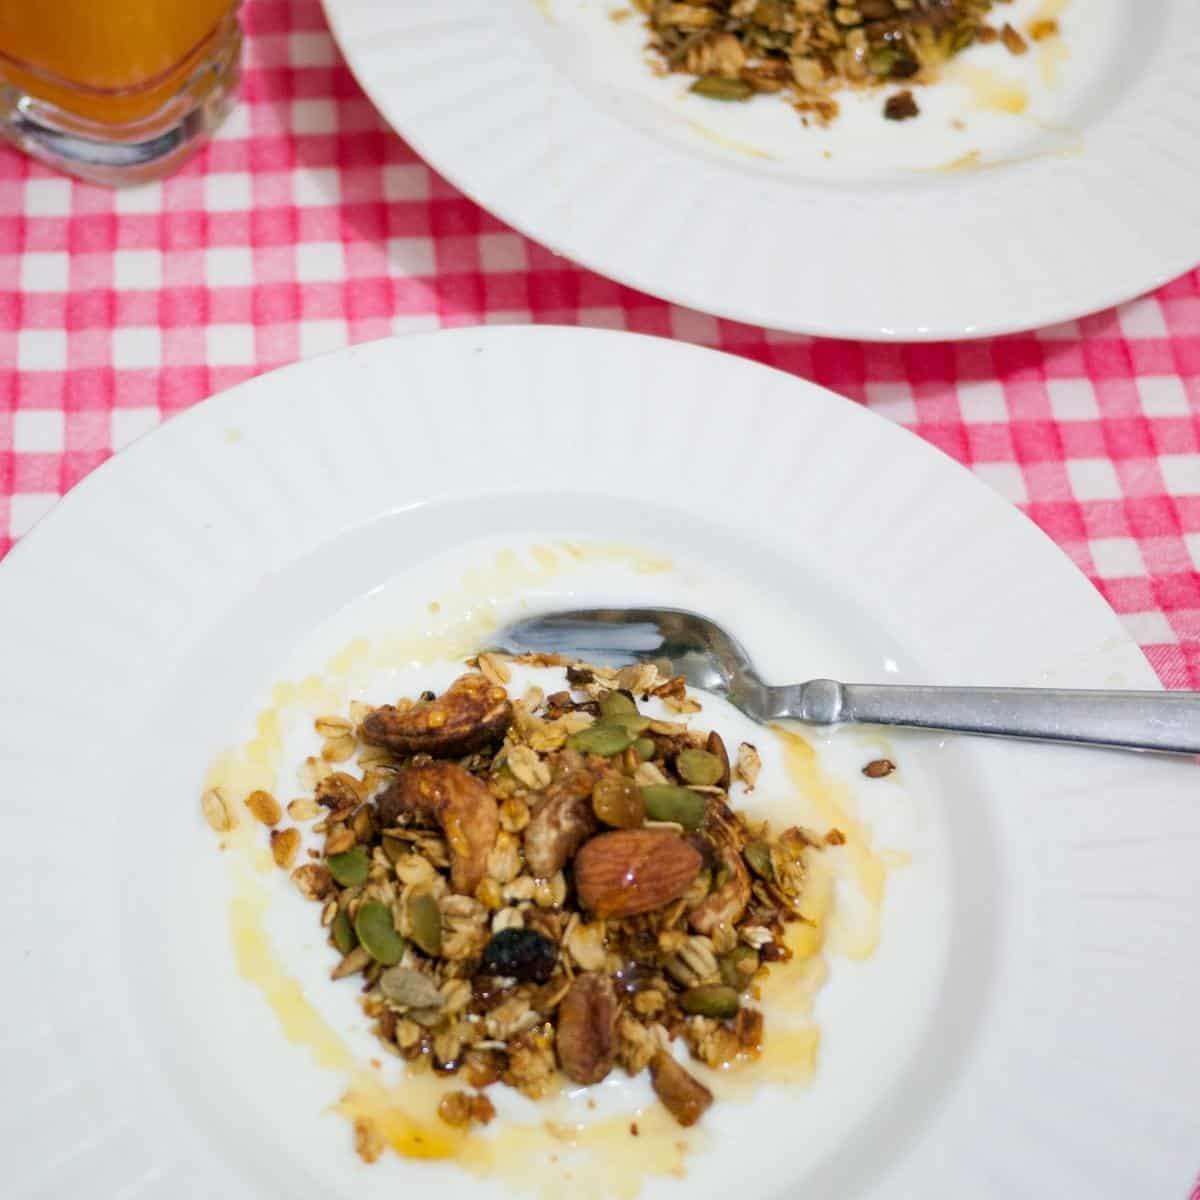 Parfait with granola, fruits, and yogurt